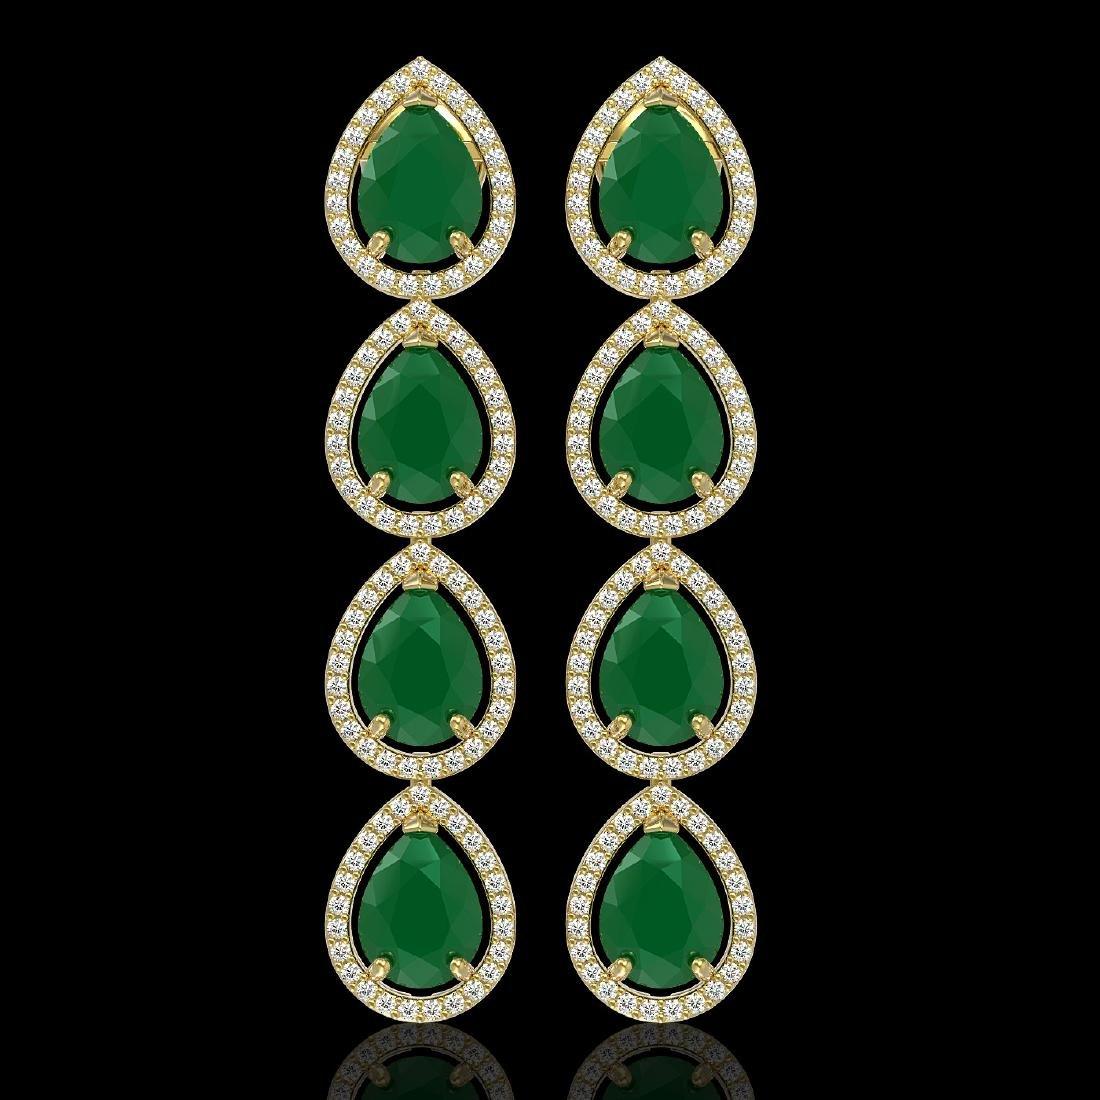 16.01 CTW Emerald & Diamond Halo Earrings 10K Yellow